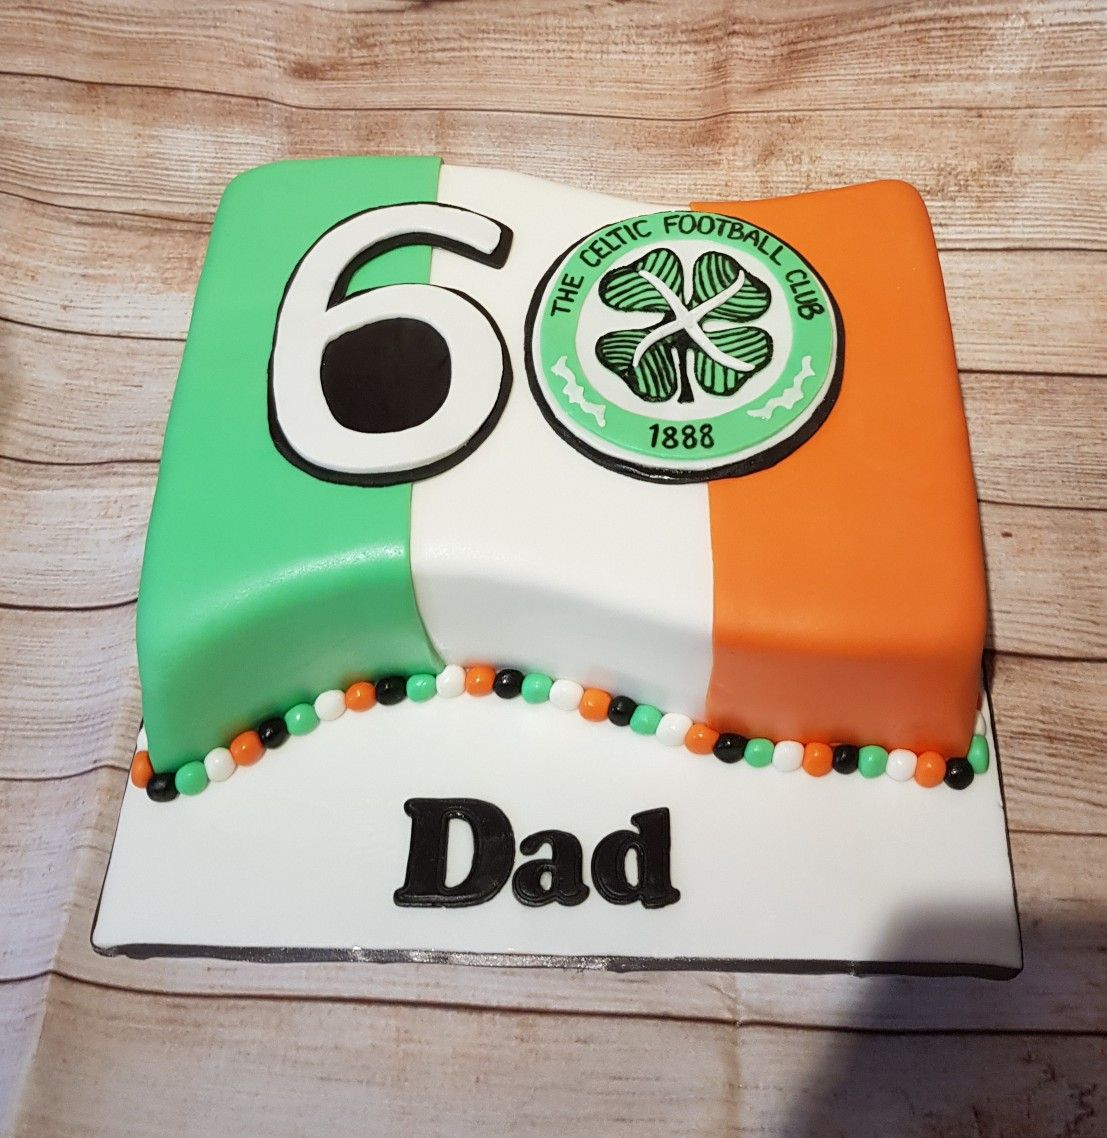 Celtic football club Irish flag cake (With images) Flag